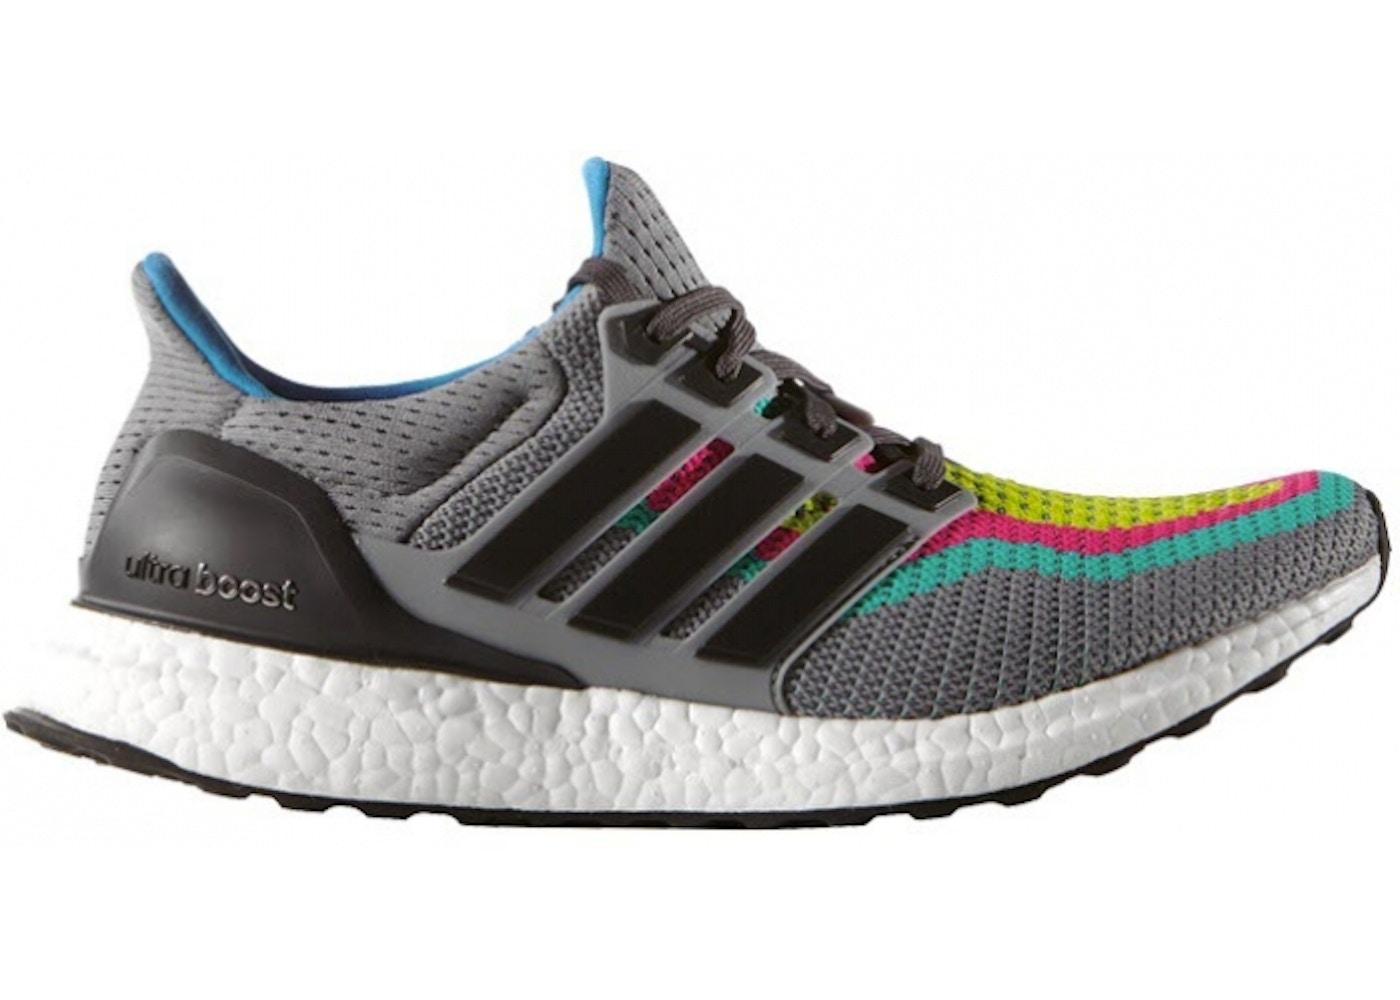 1b99e9923f24d adidas Ultra Boost 2.0 Multi-Color Gradient - AQ4003